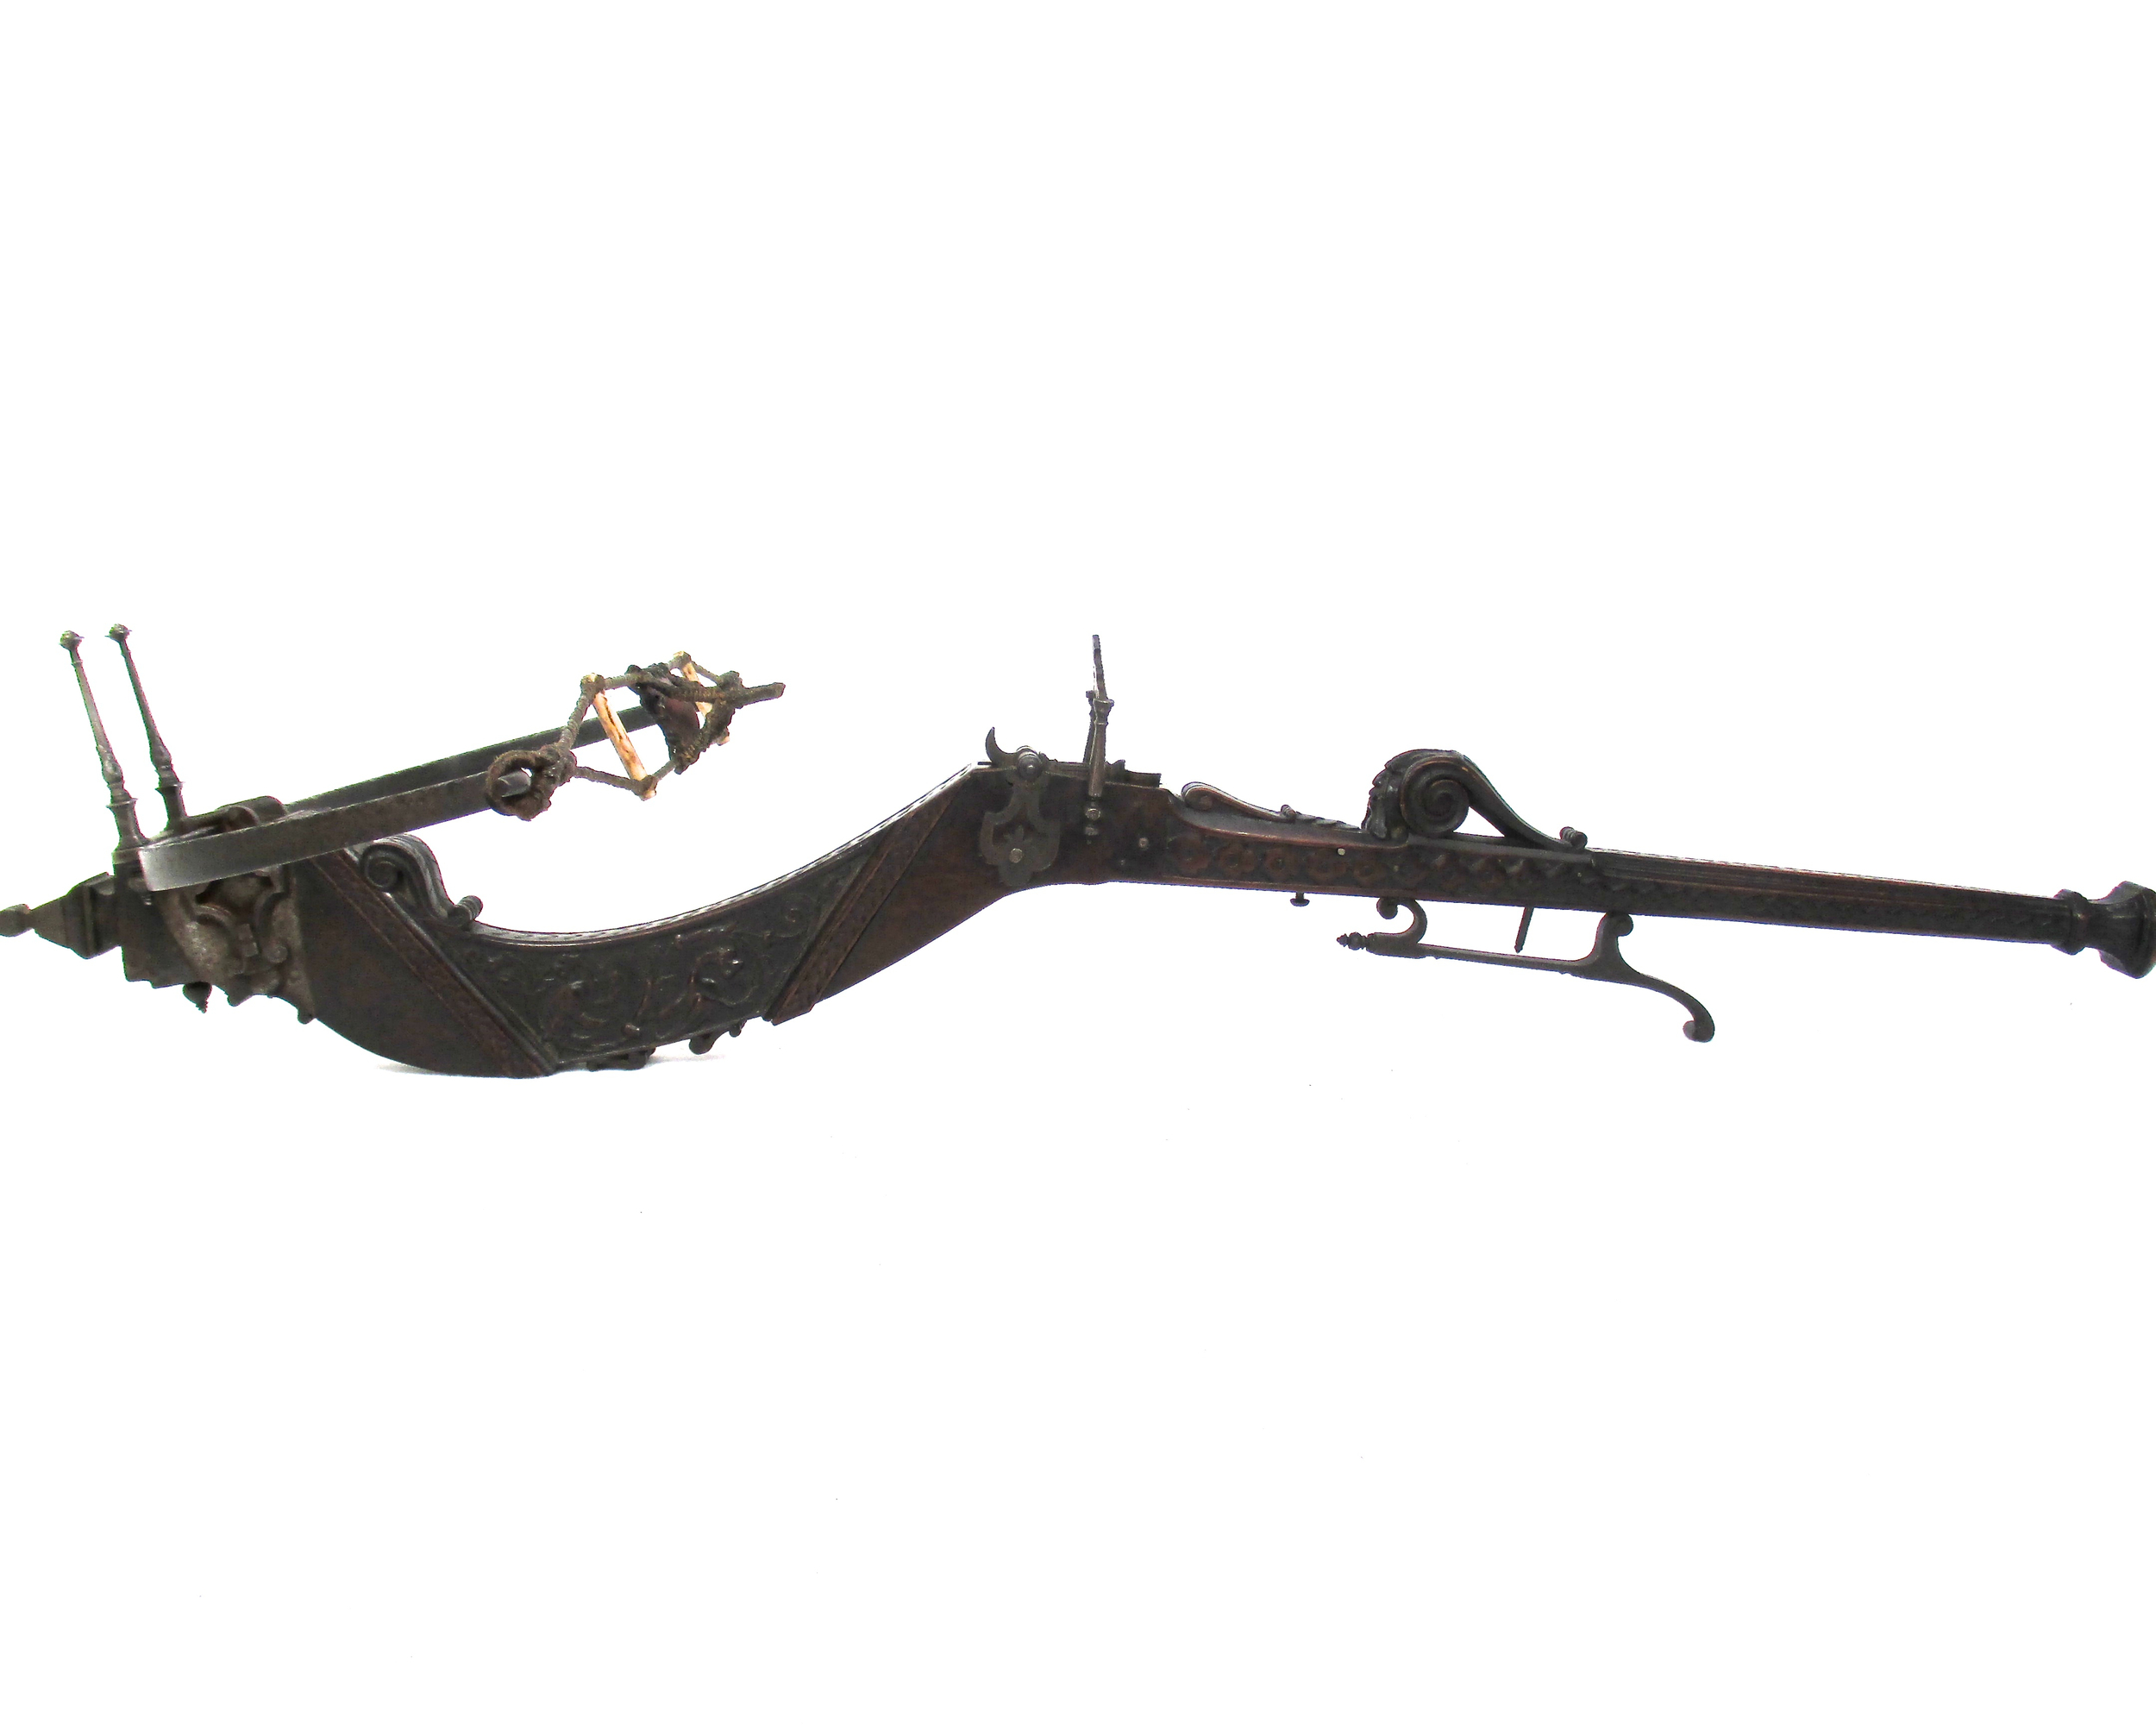 italian-stonebow-crossbow-tuscany-16thc-gary-friedland-arms-armor-weapons2.jpg